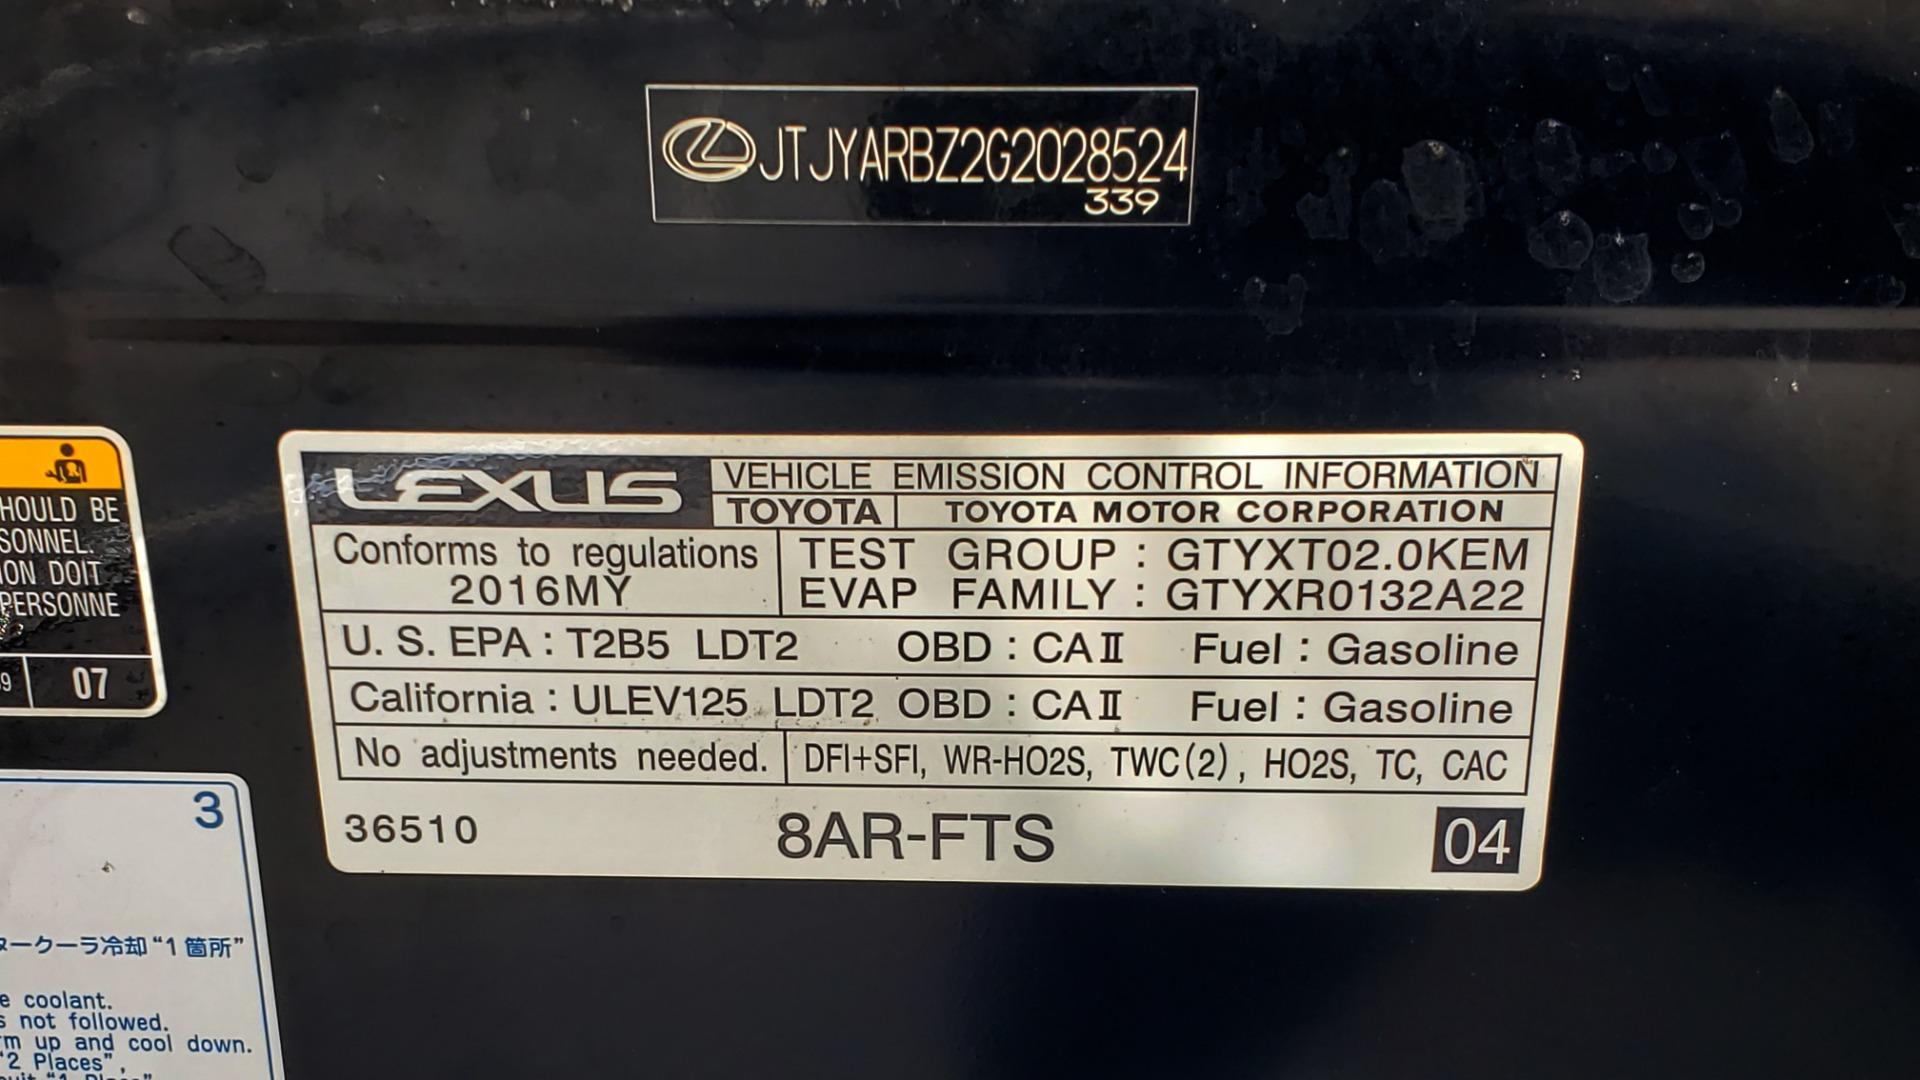 Used 2016 Lexus NX 200T PREM PKG / NAV / SUNROOF / PRE-COLLISION / PARK ASST for sale Sold at Formula Imports in Charlotte NC 28227 12